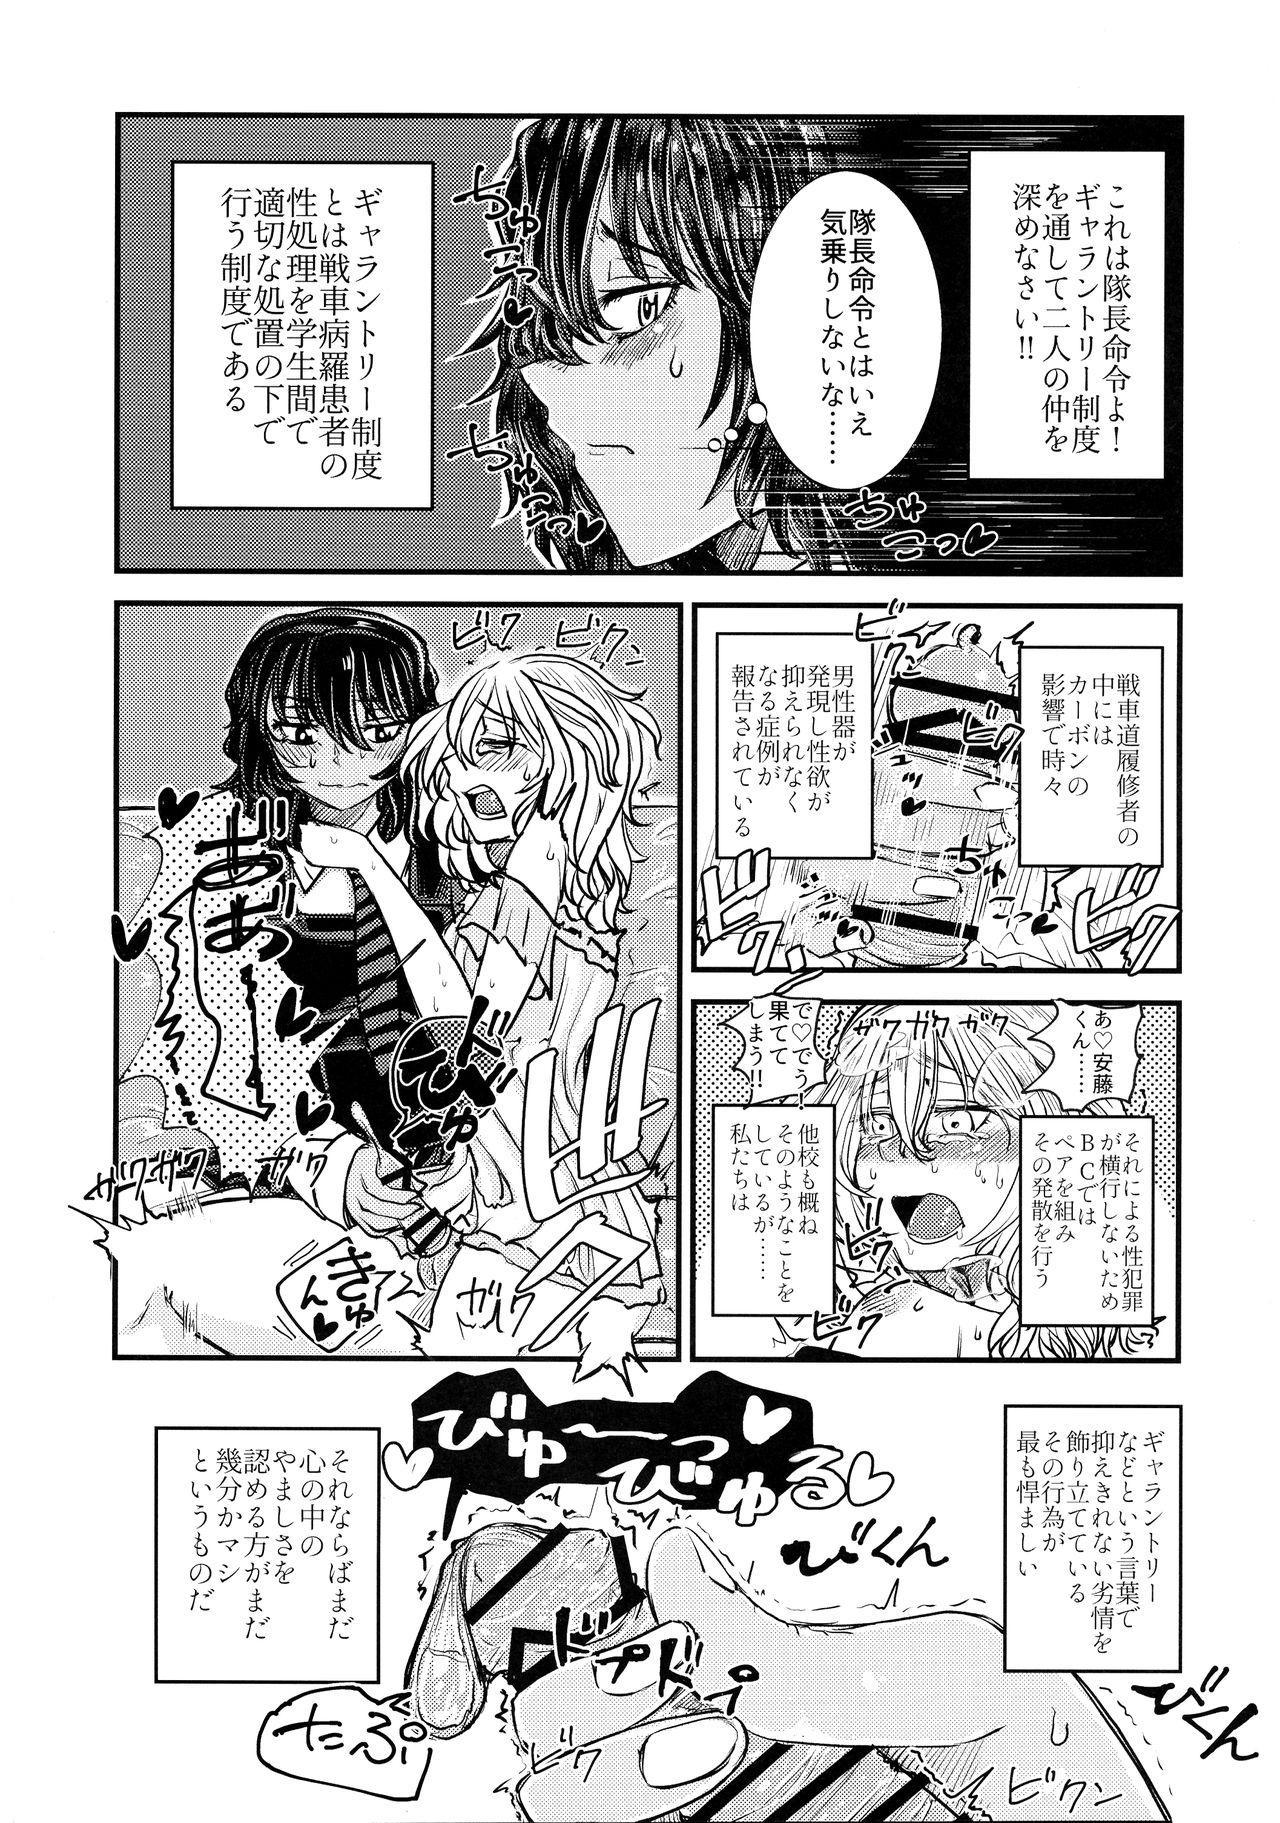 Kimi o Aishitai. 5